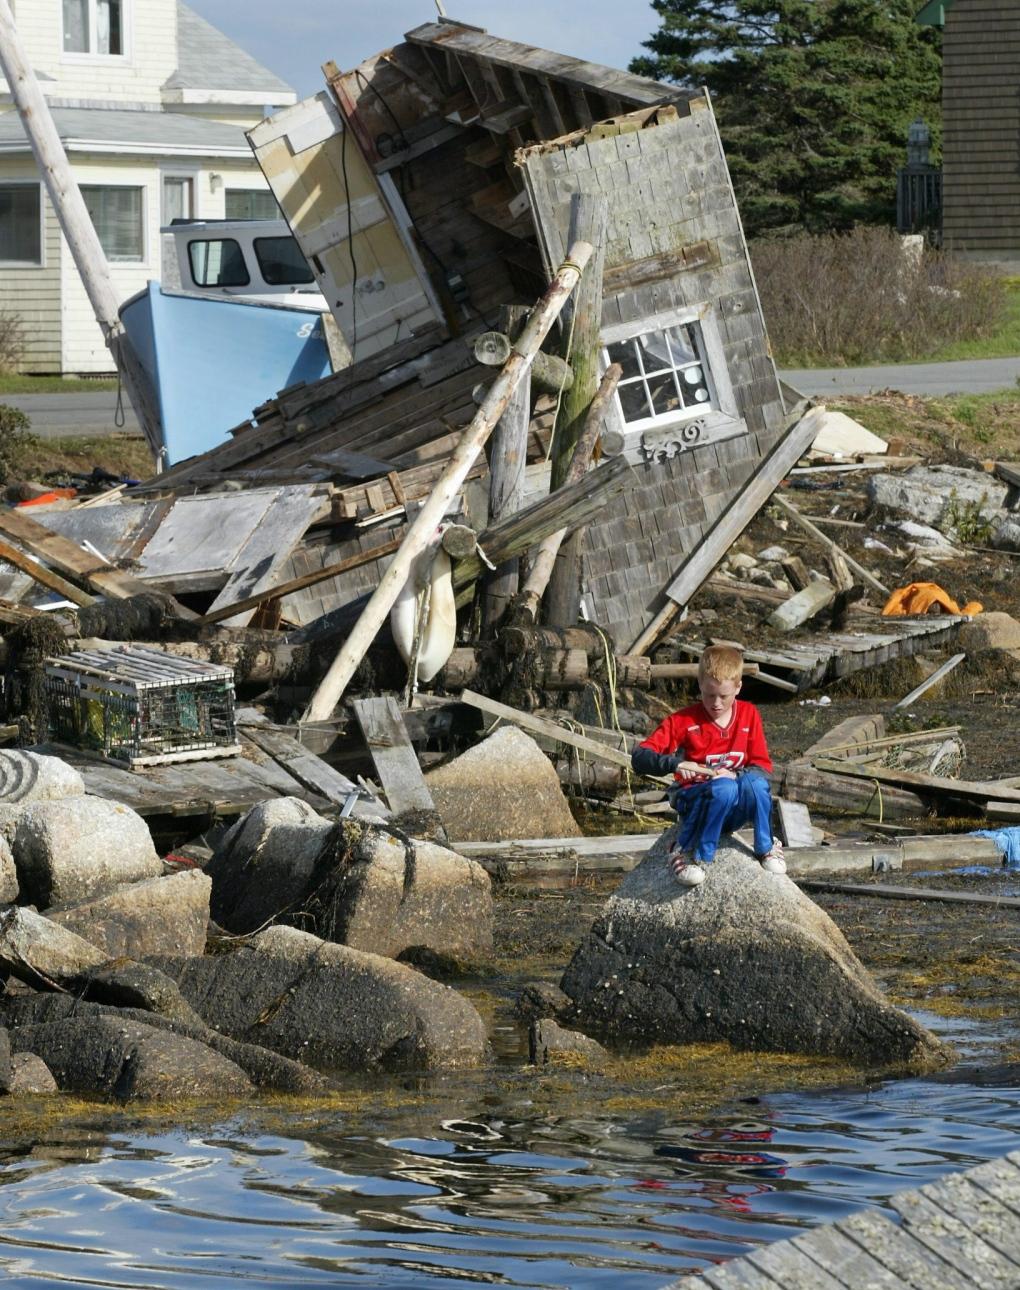 A Decade Later Hurricane Juan S Destructive Legacy Lingers In Halifax Ctv News